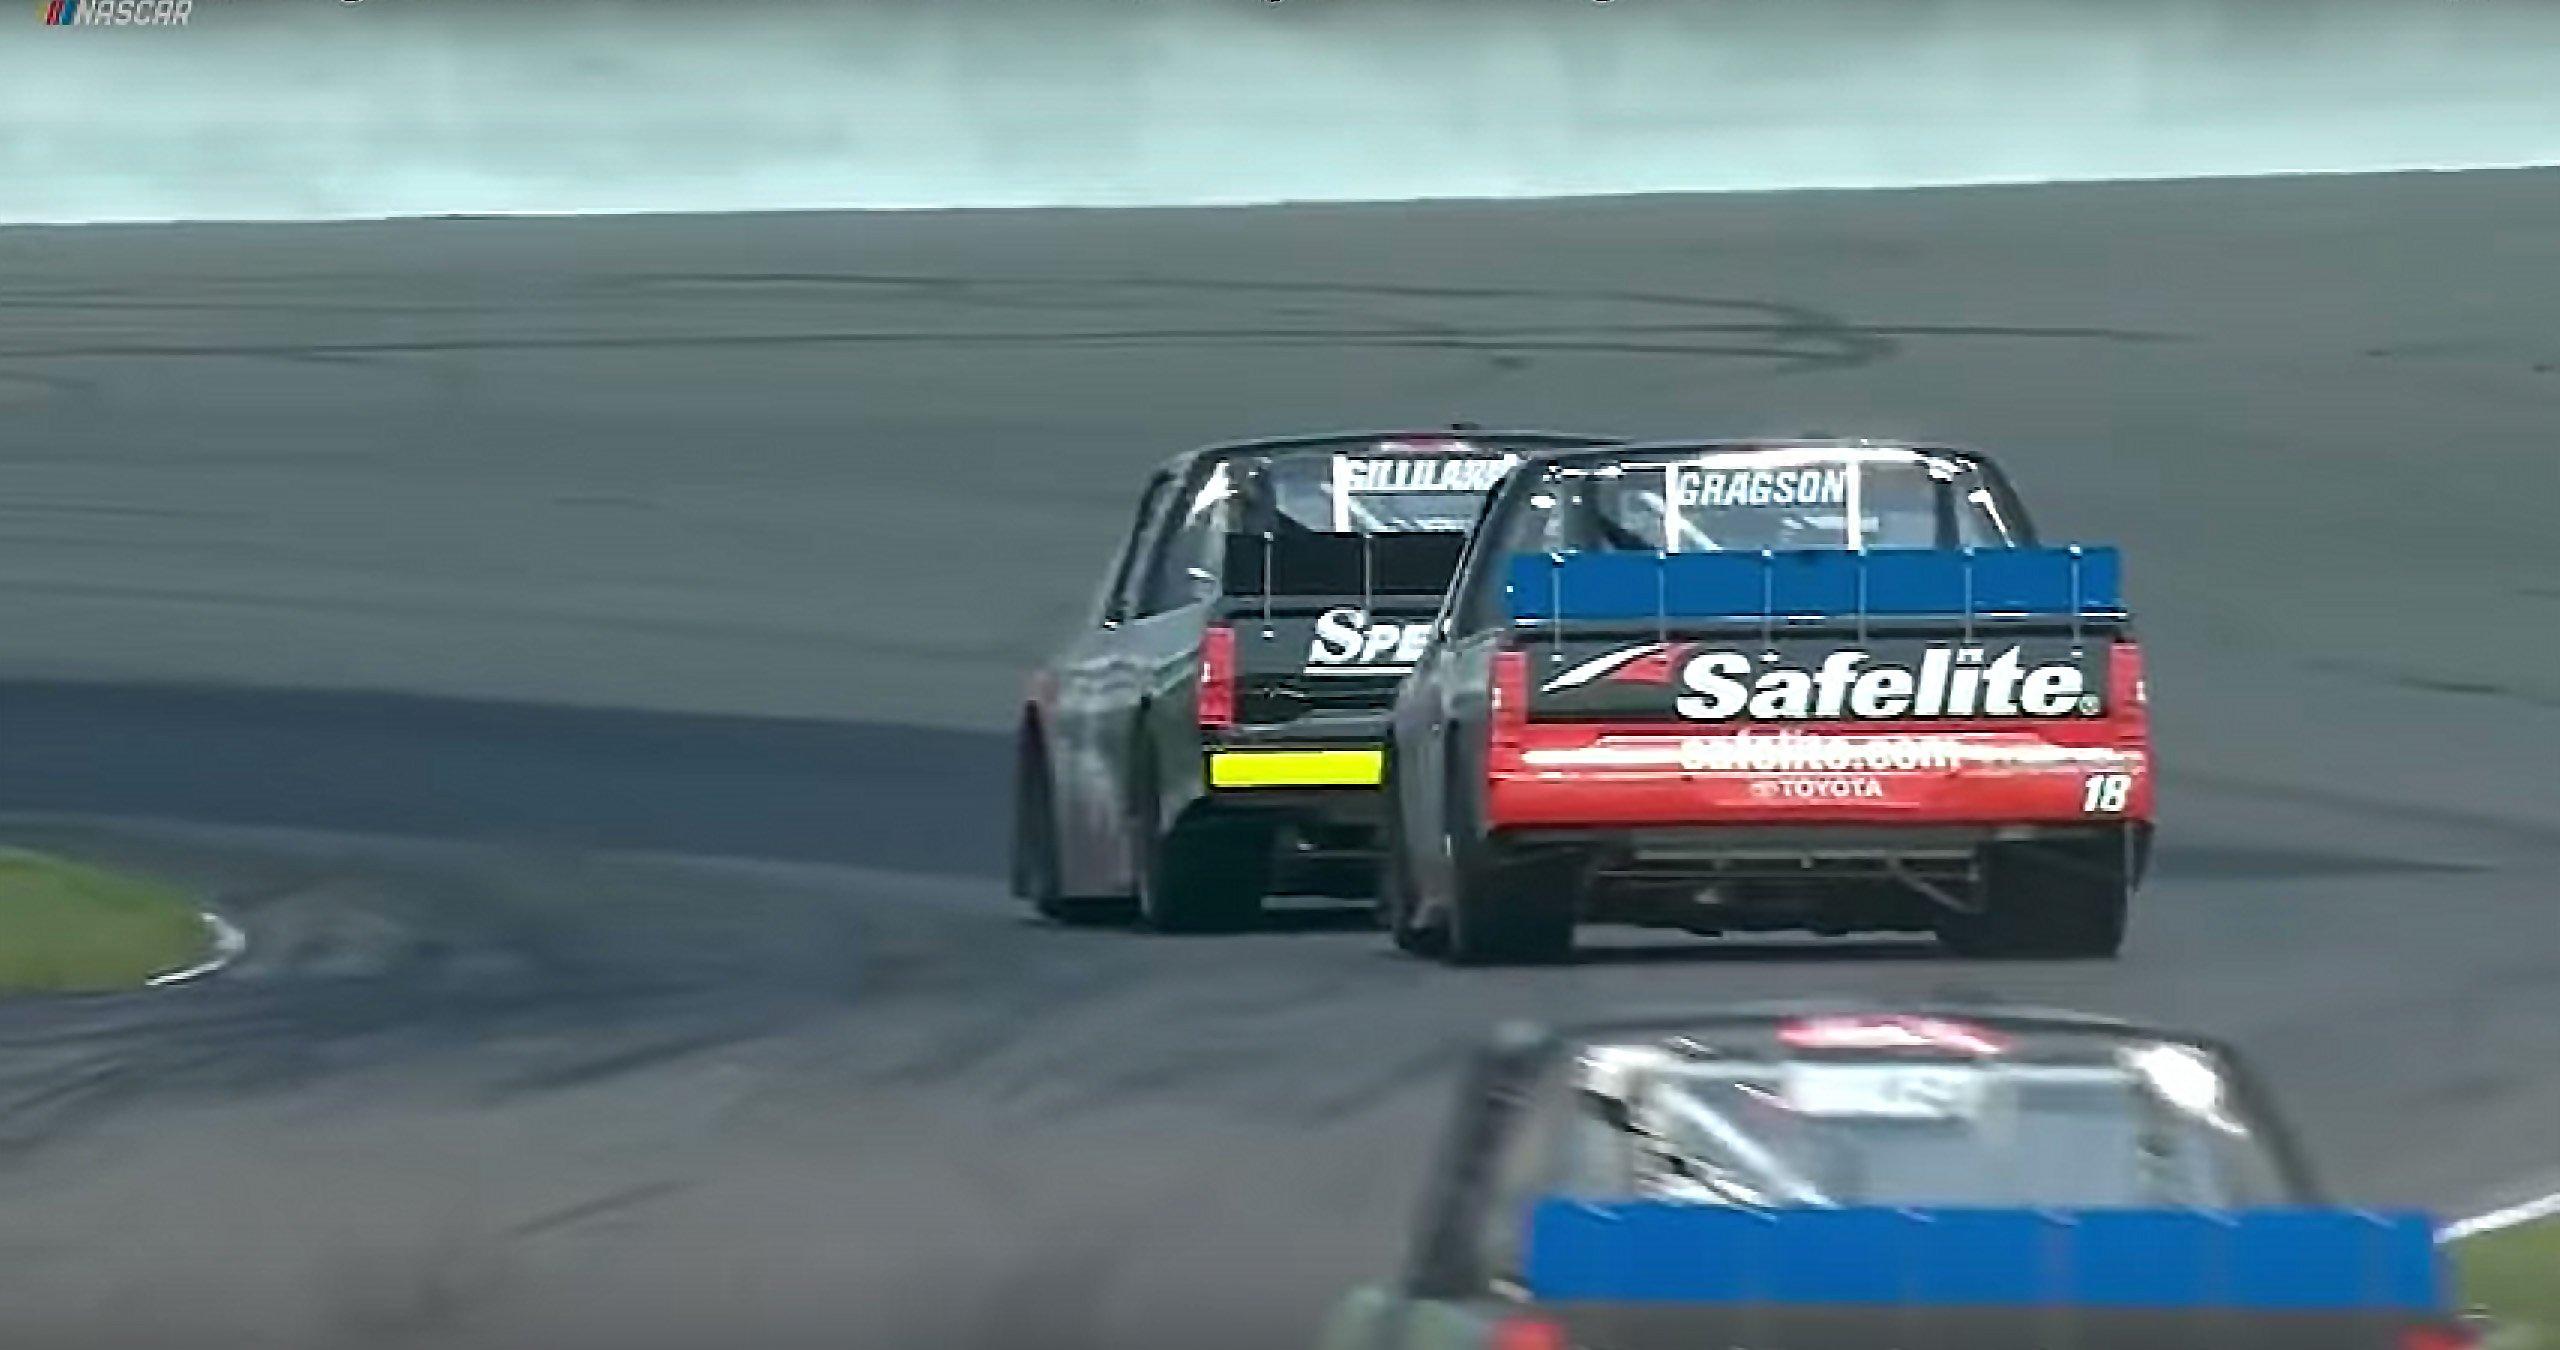 Noah Gragson Todd Gilliland wreck at Canadian Tire Motorsport Park